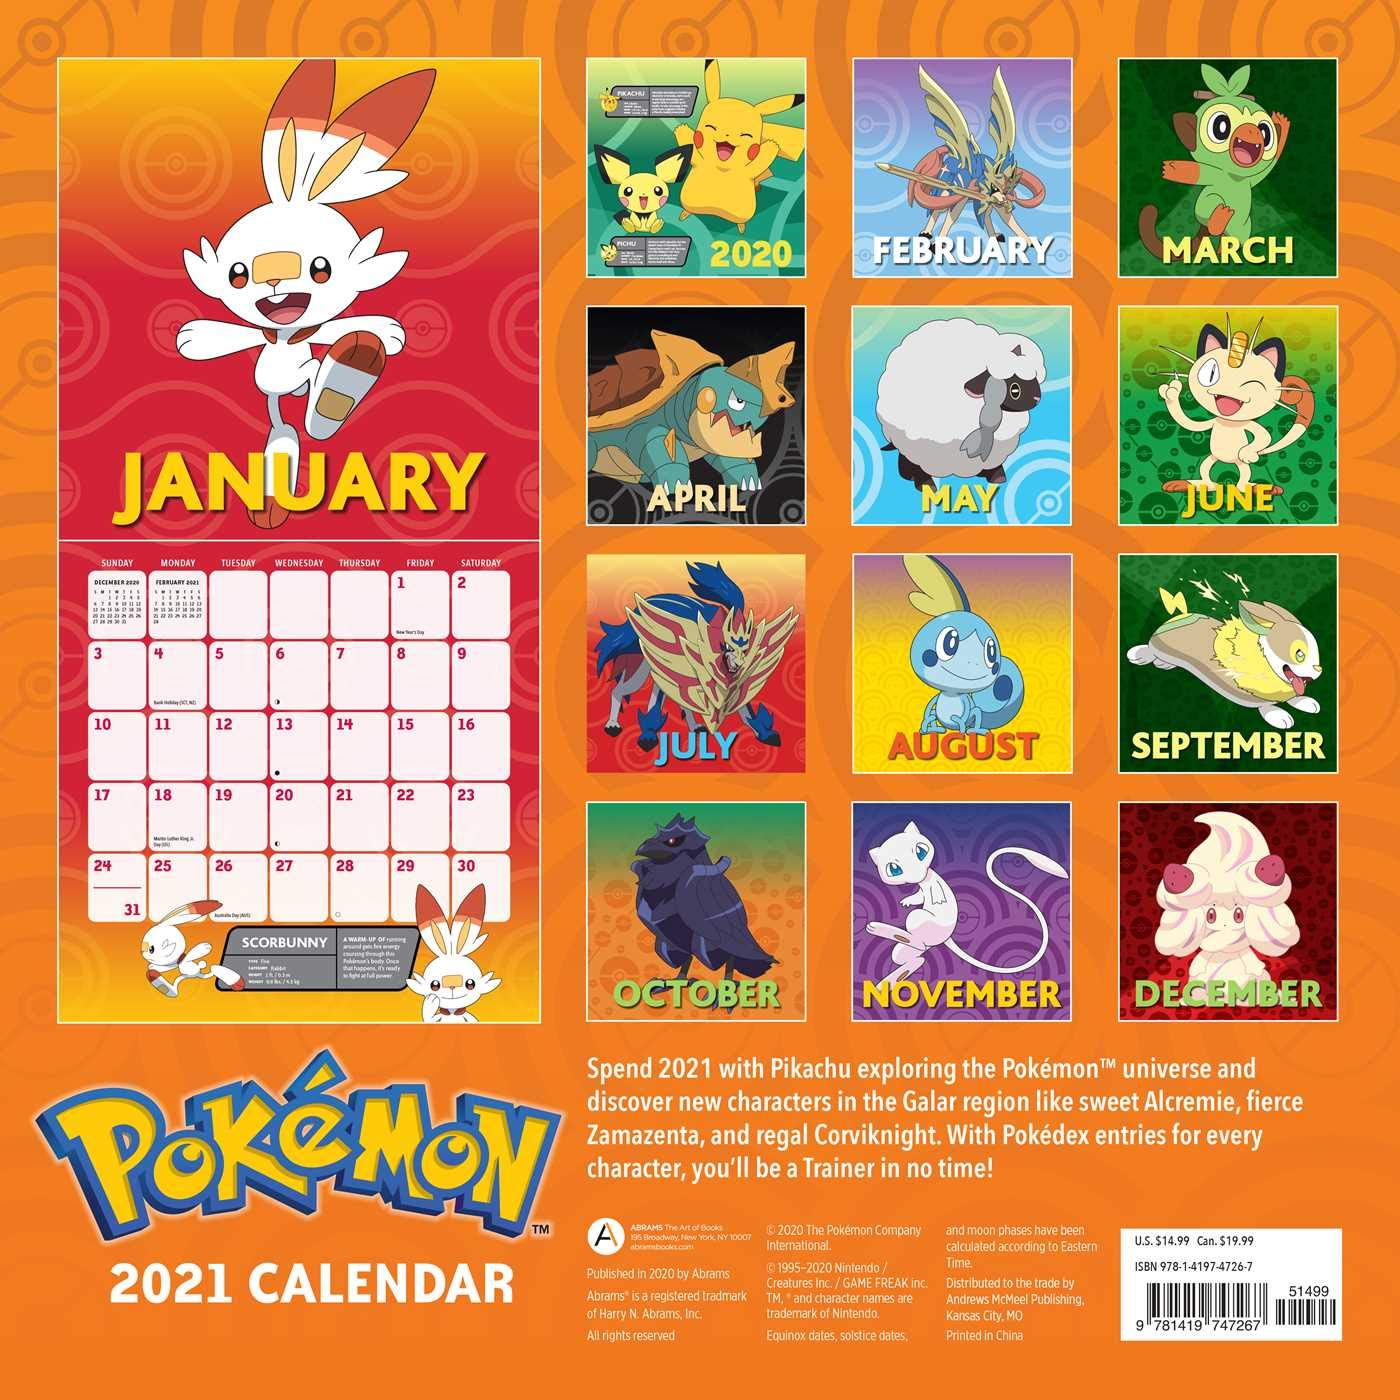 Pokemon 2021 Wall Calendar: Pokémon: 9781419747267: Amazon.com: Books